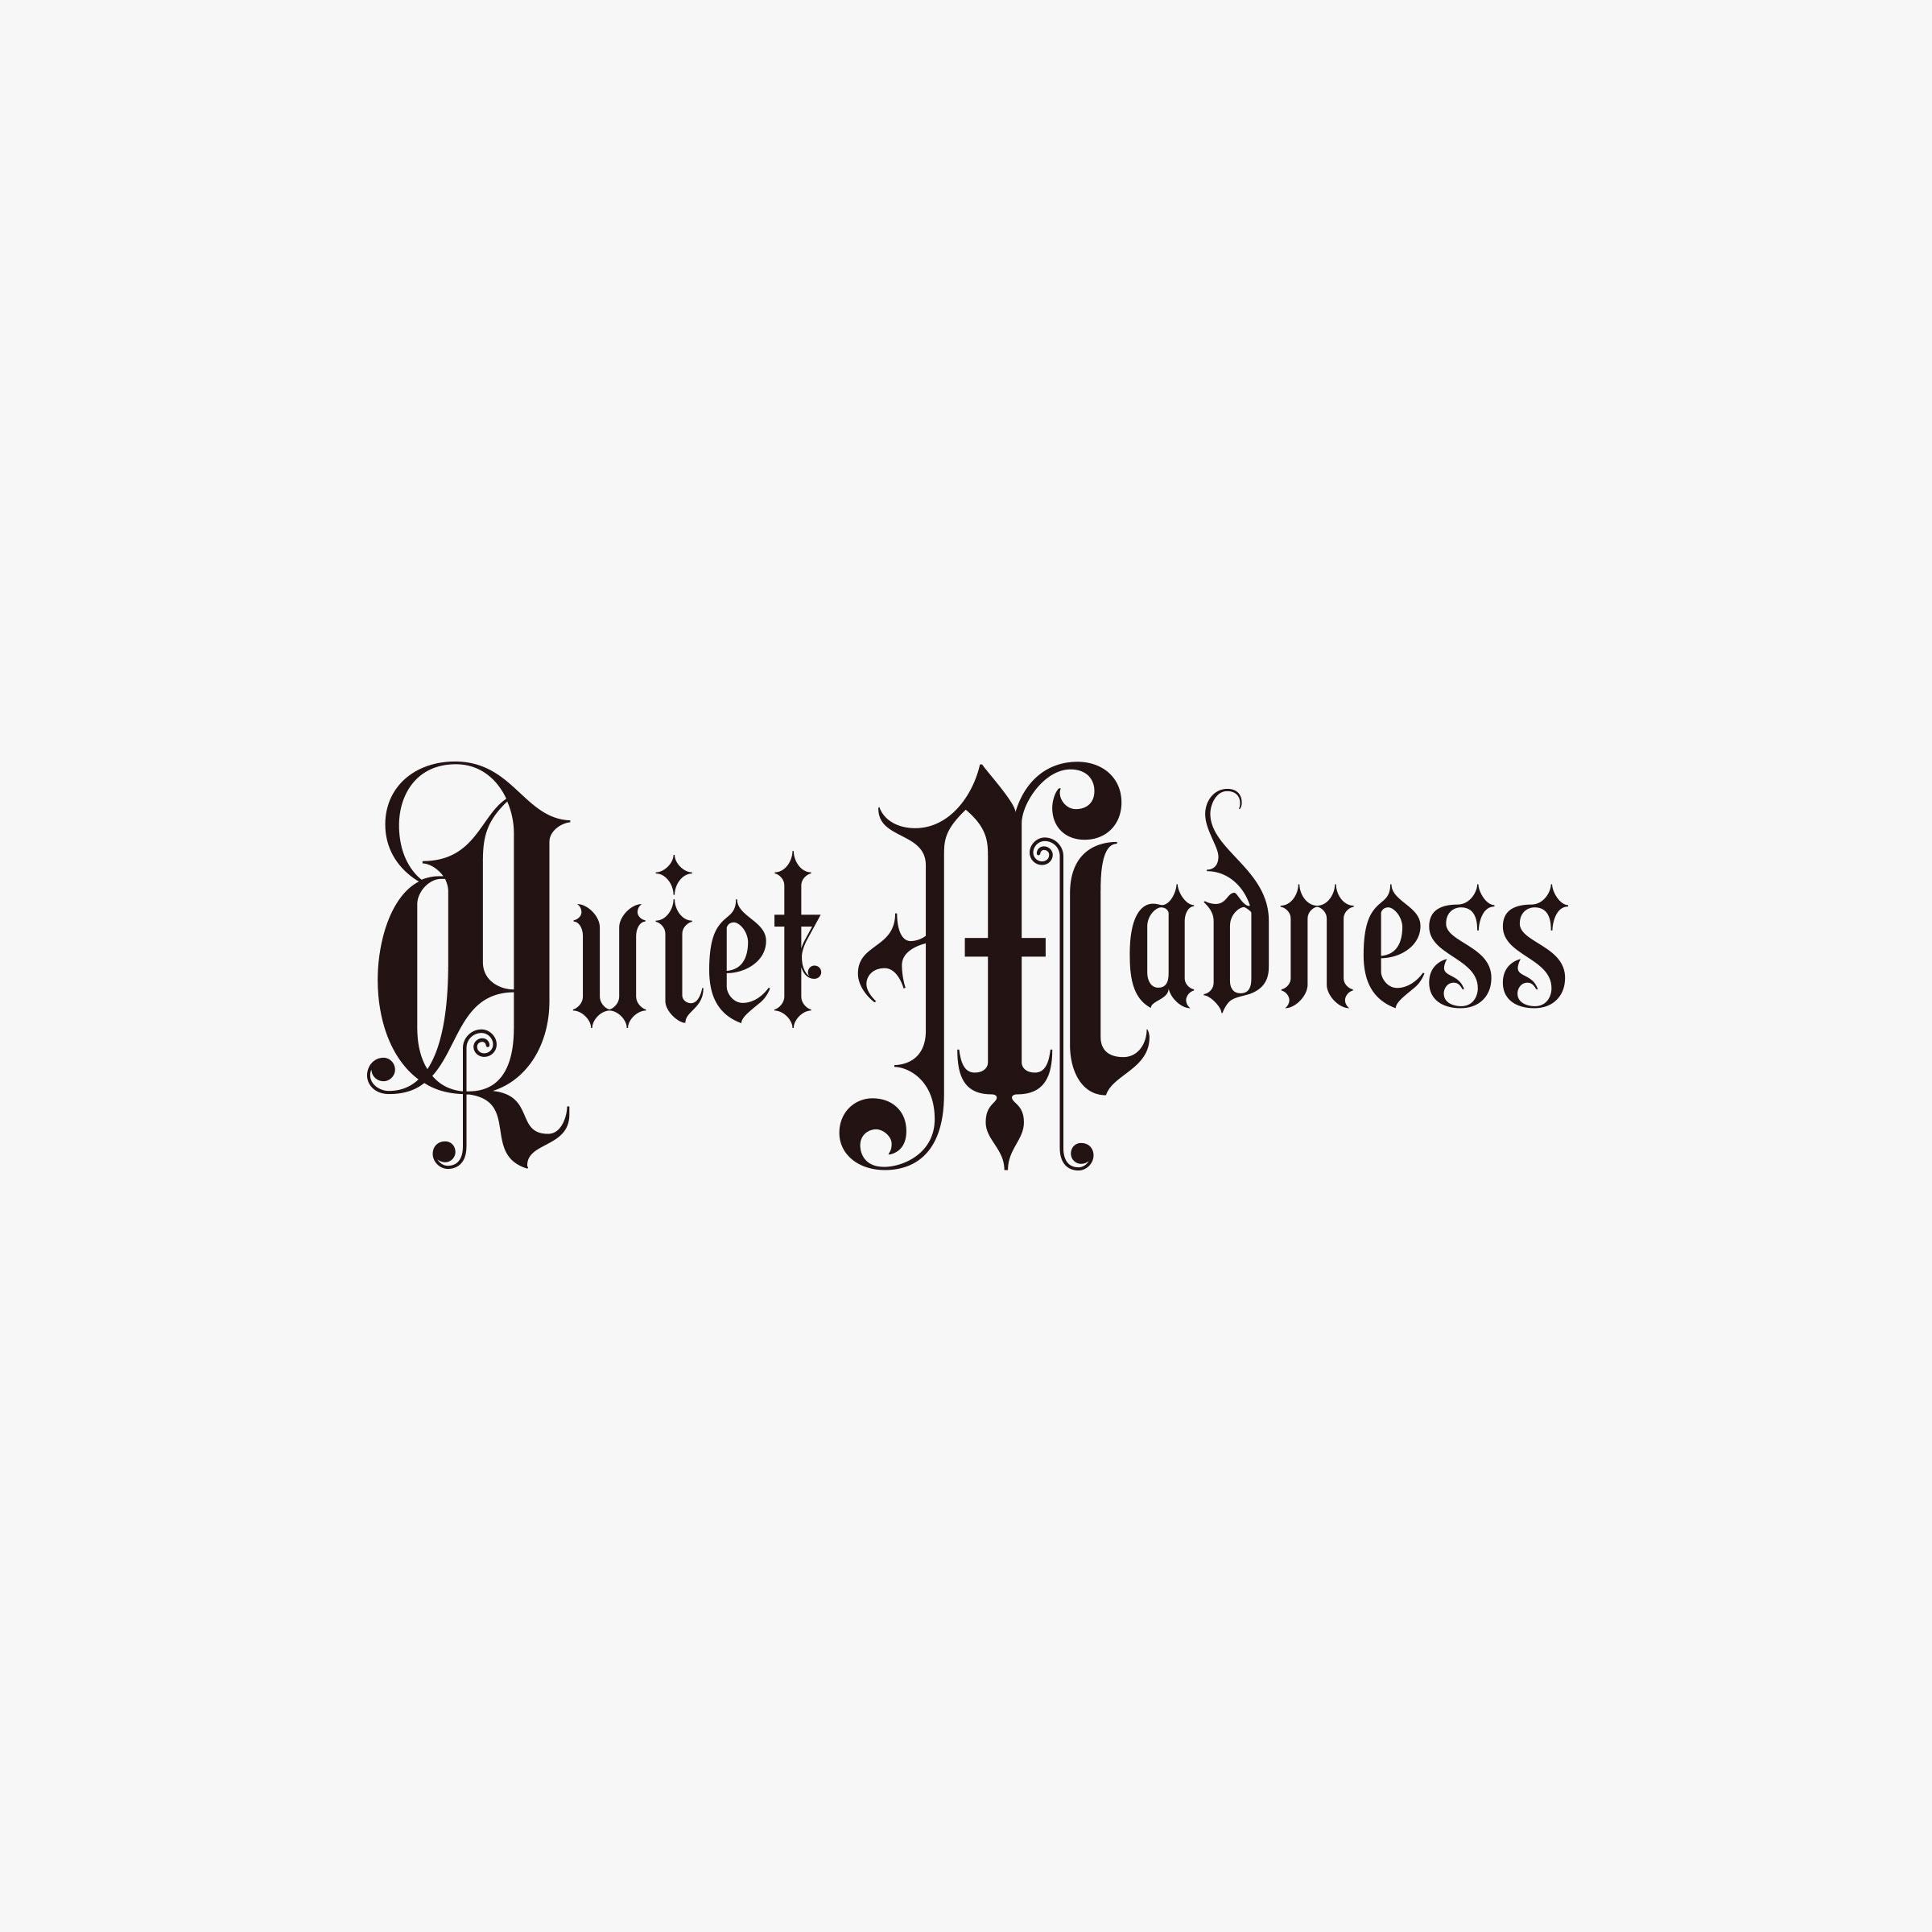 quiet-madness-logotype-logo-design-by-create.jpg